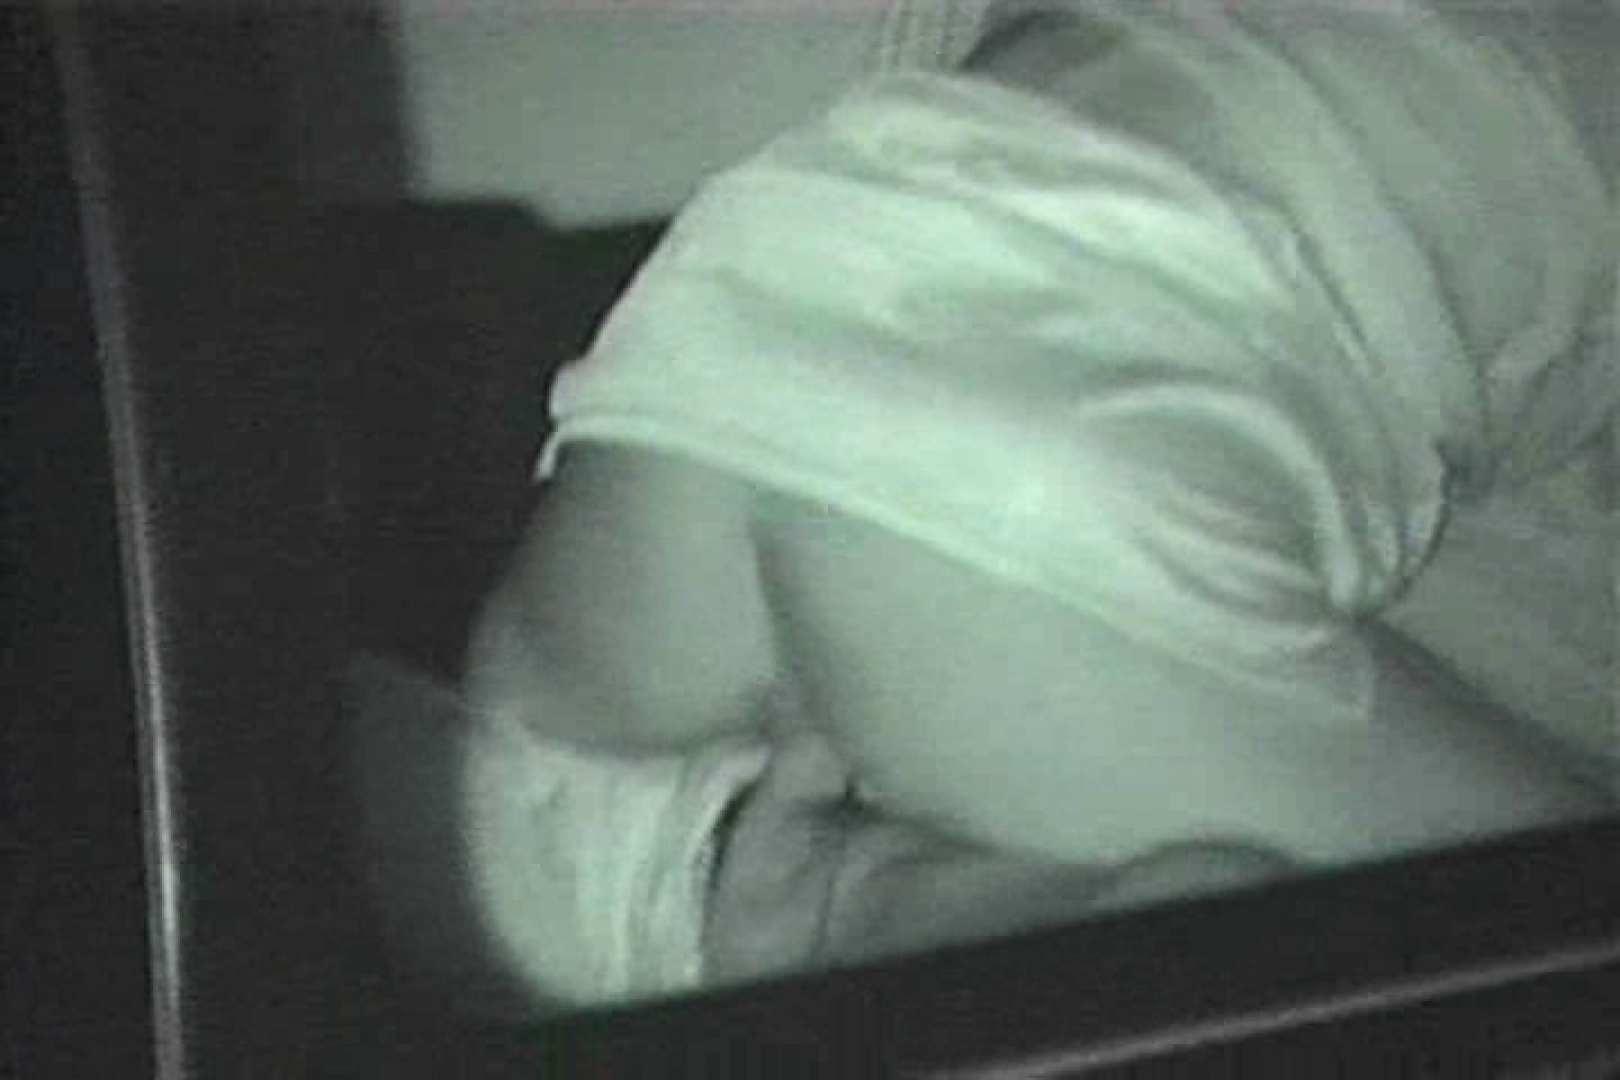 MASAさんの待ち伏せ撮り! 赤外線カーセックスVol.8 カーセックス 盗撮エロ画像 99連発 20